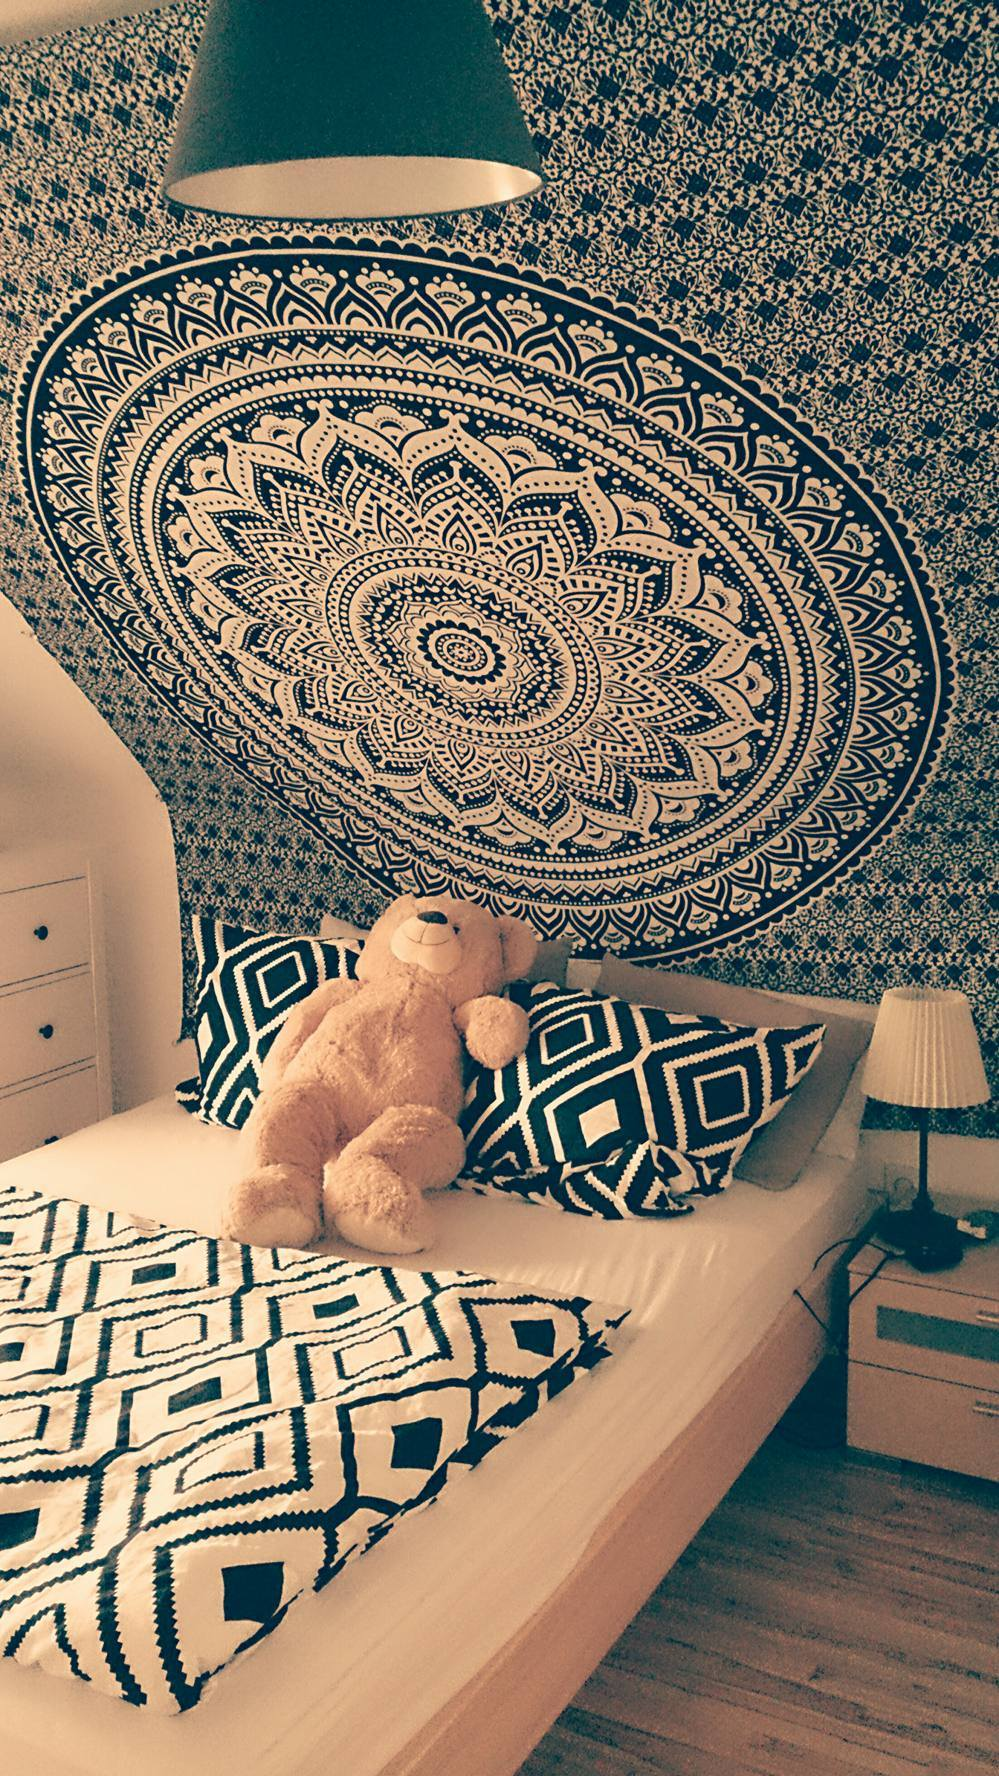 Mandala Wandtuch in schwarz an Dachschräge